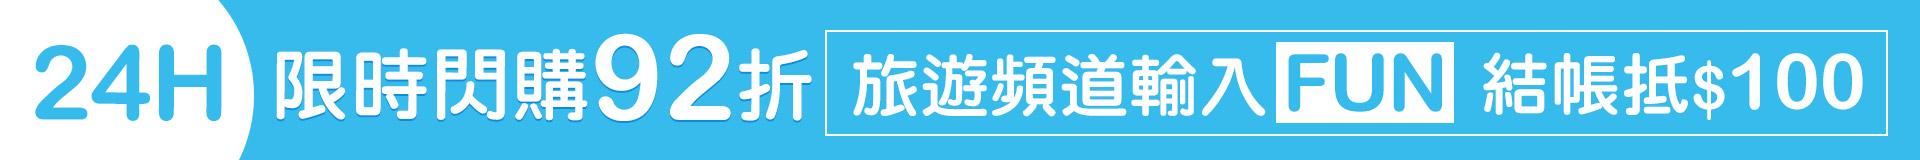 24H旅遊閃購 92折